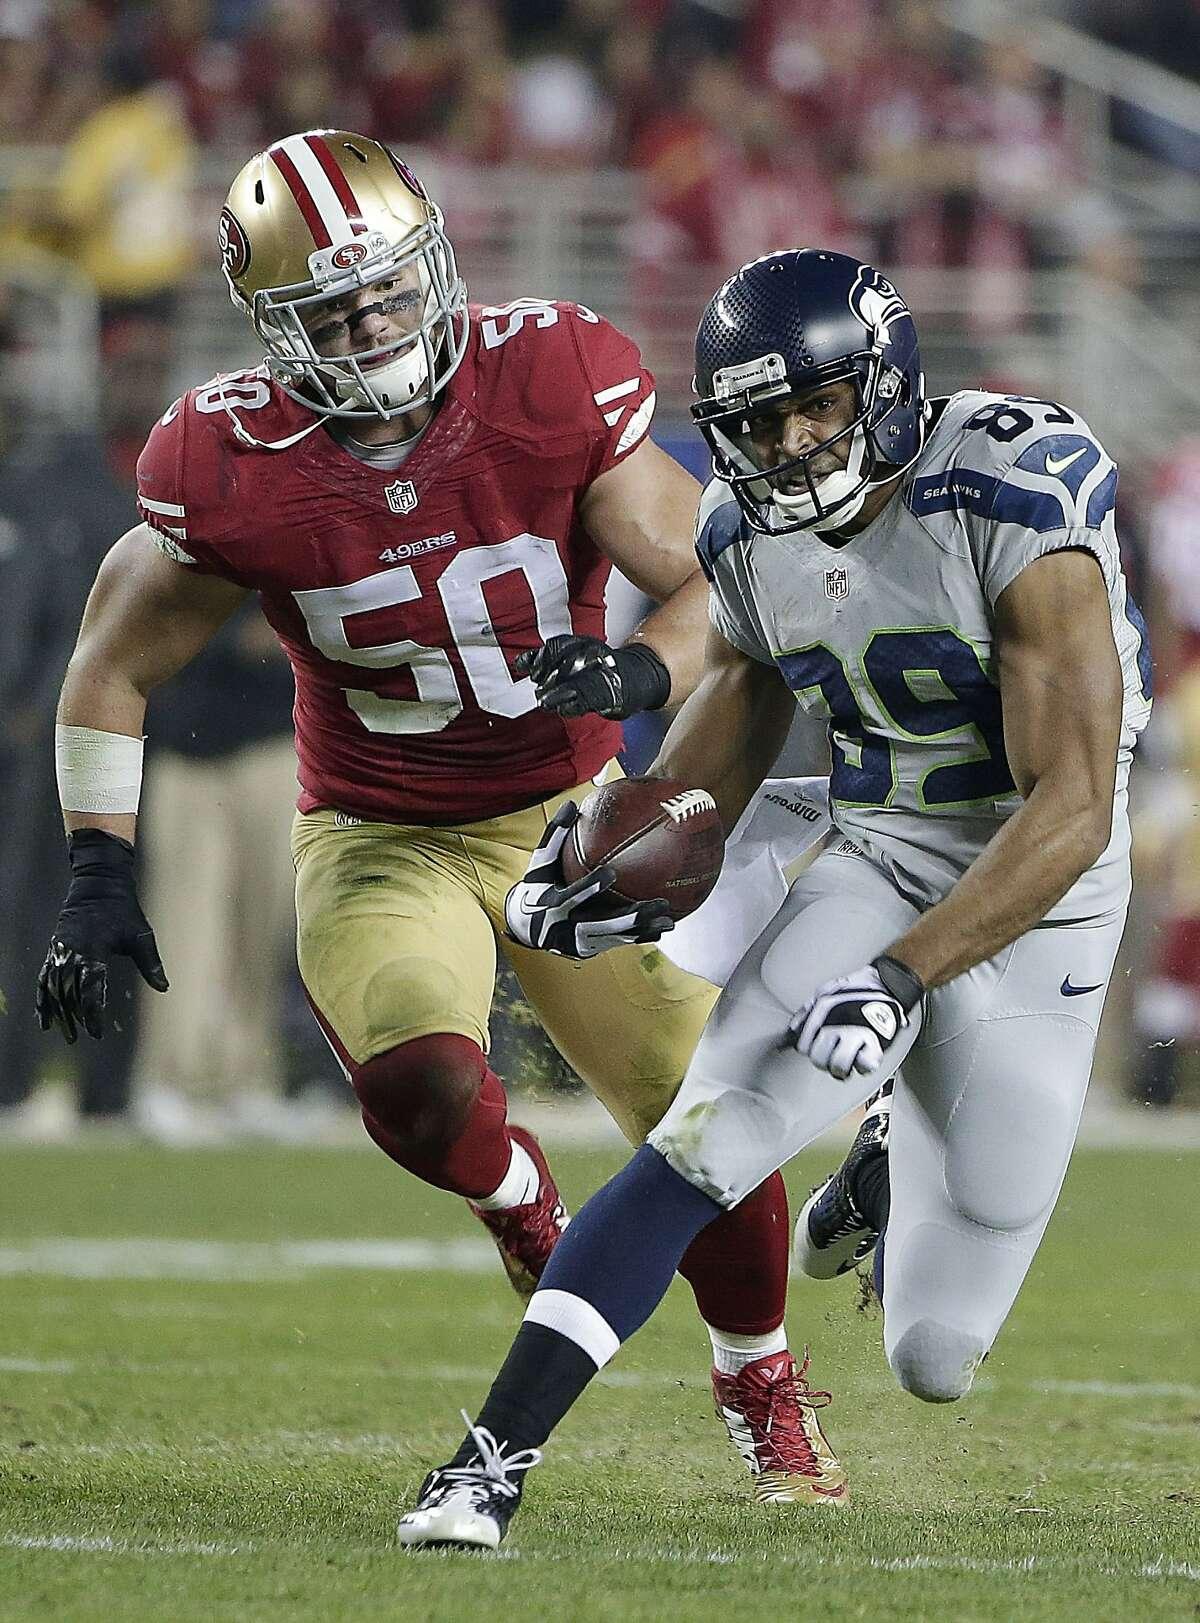 Seattle Seahawks wide receiver Doug Baldwin (89) runs from San Francisco 49ers inside linebacker Chris Borland (50) during the first quarter of an NFL football game in Santa Clara, Calif., Thursday, Nov. 27, 2014. (AP Photo/Marcio Jose Sanchez)